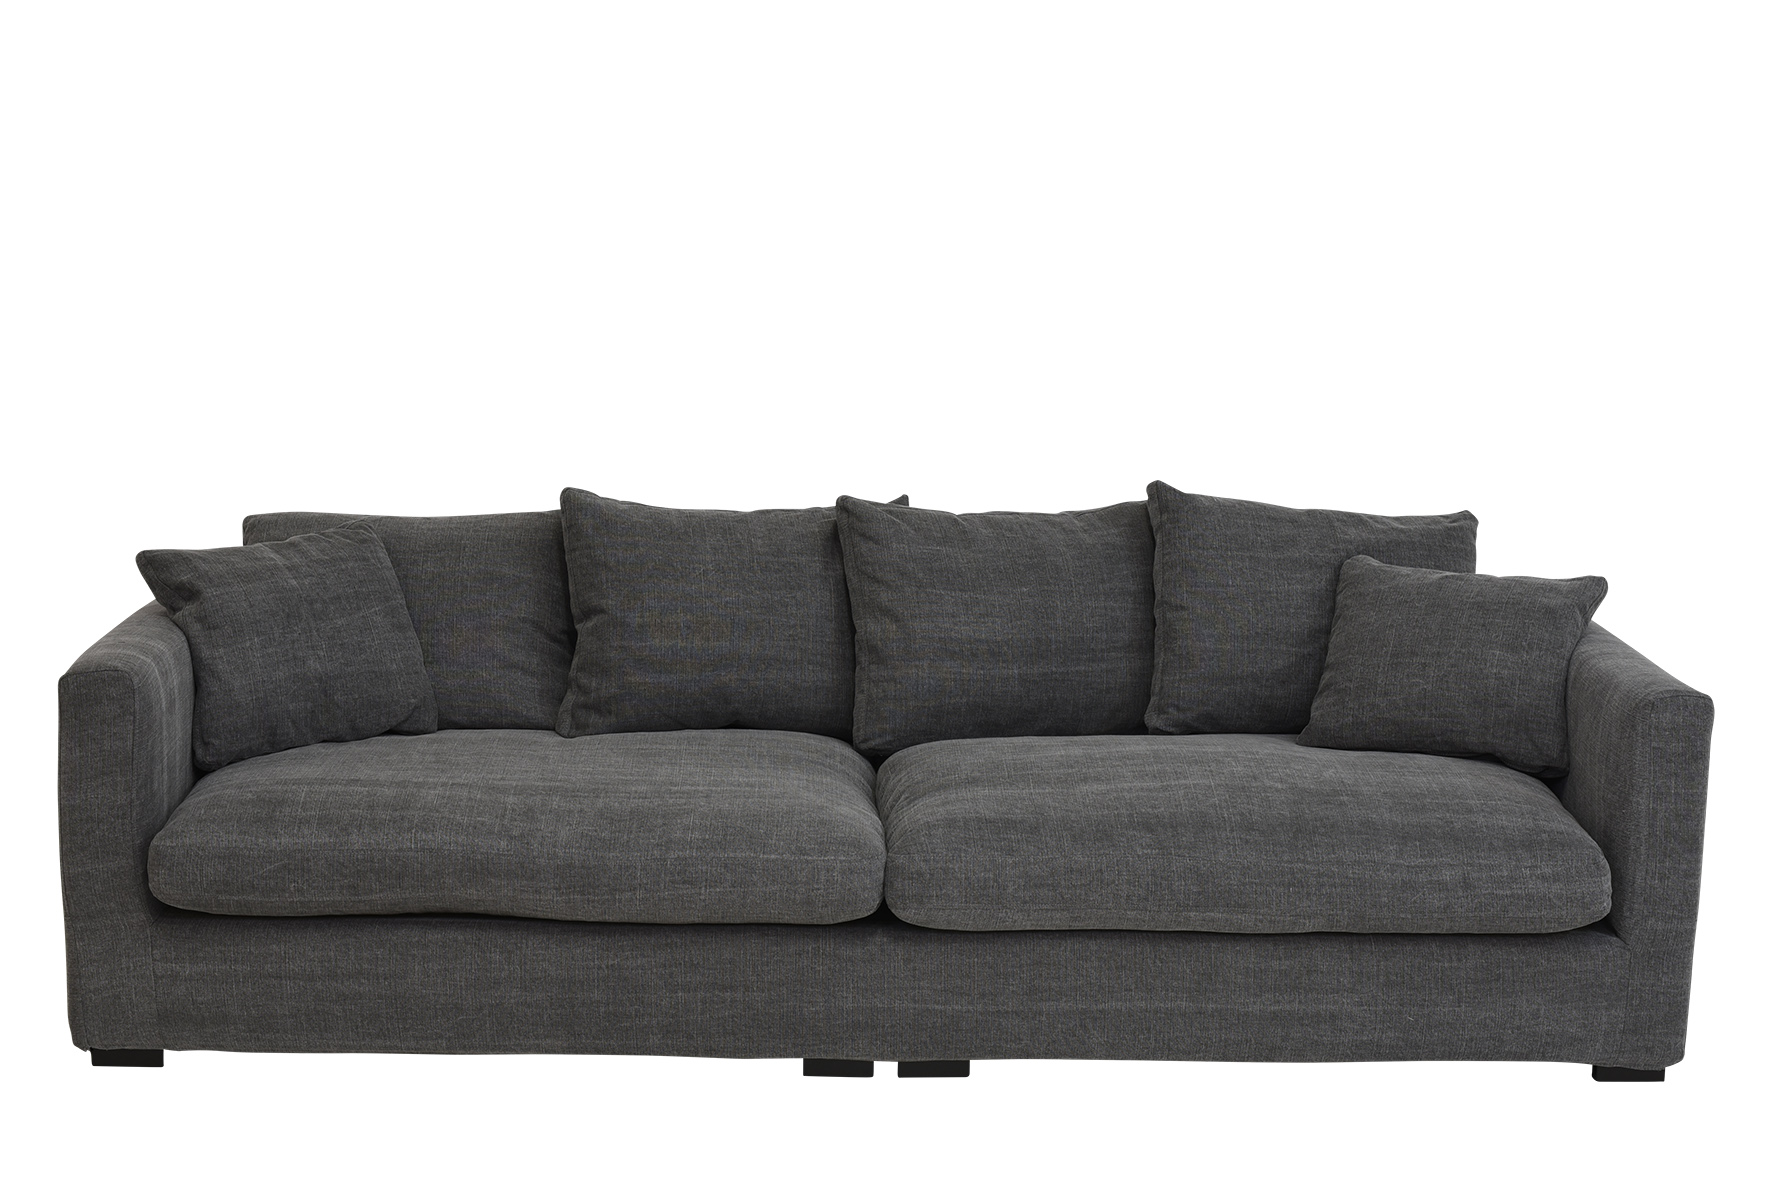 Bigsofa Max Perfekter Sitzkomfort Durch Daunenfullung Grau